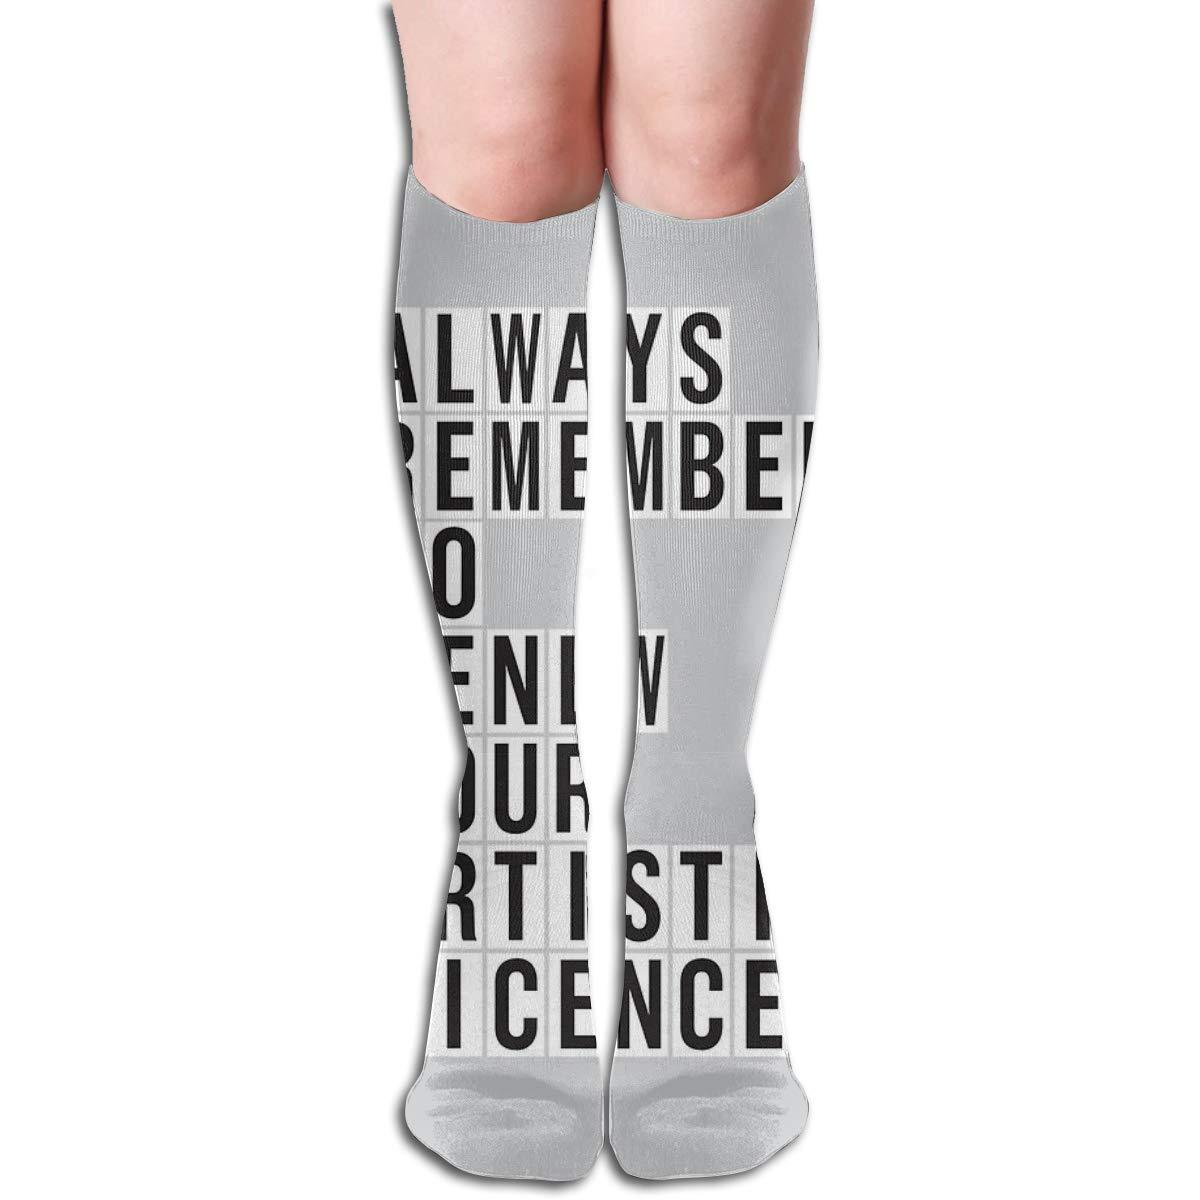 LICENCE RENEWAL Compression Socks Soccer Socks High Socks For Running,Medical,Athletic,Edema,Varicose Veins,Travel,Nursing.